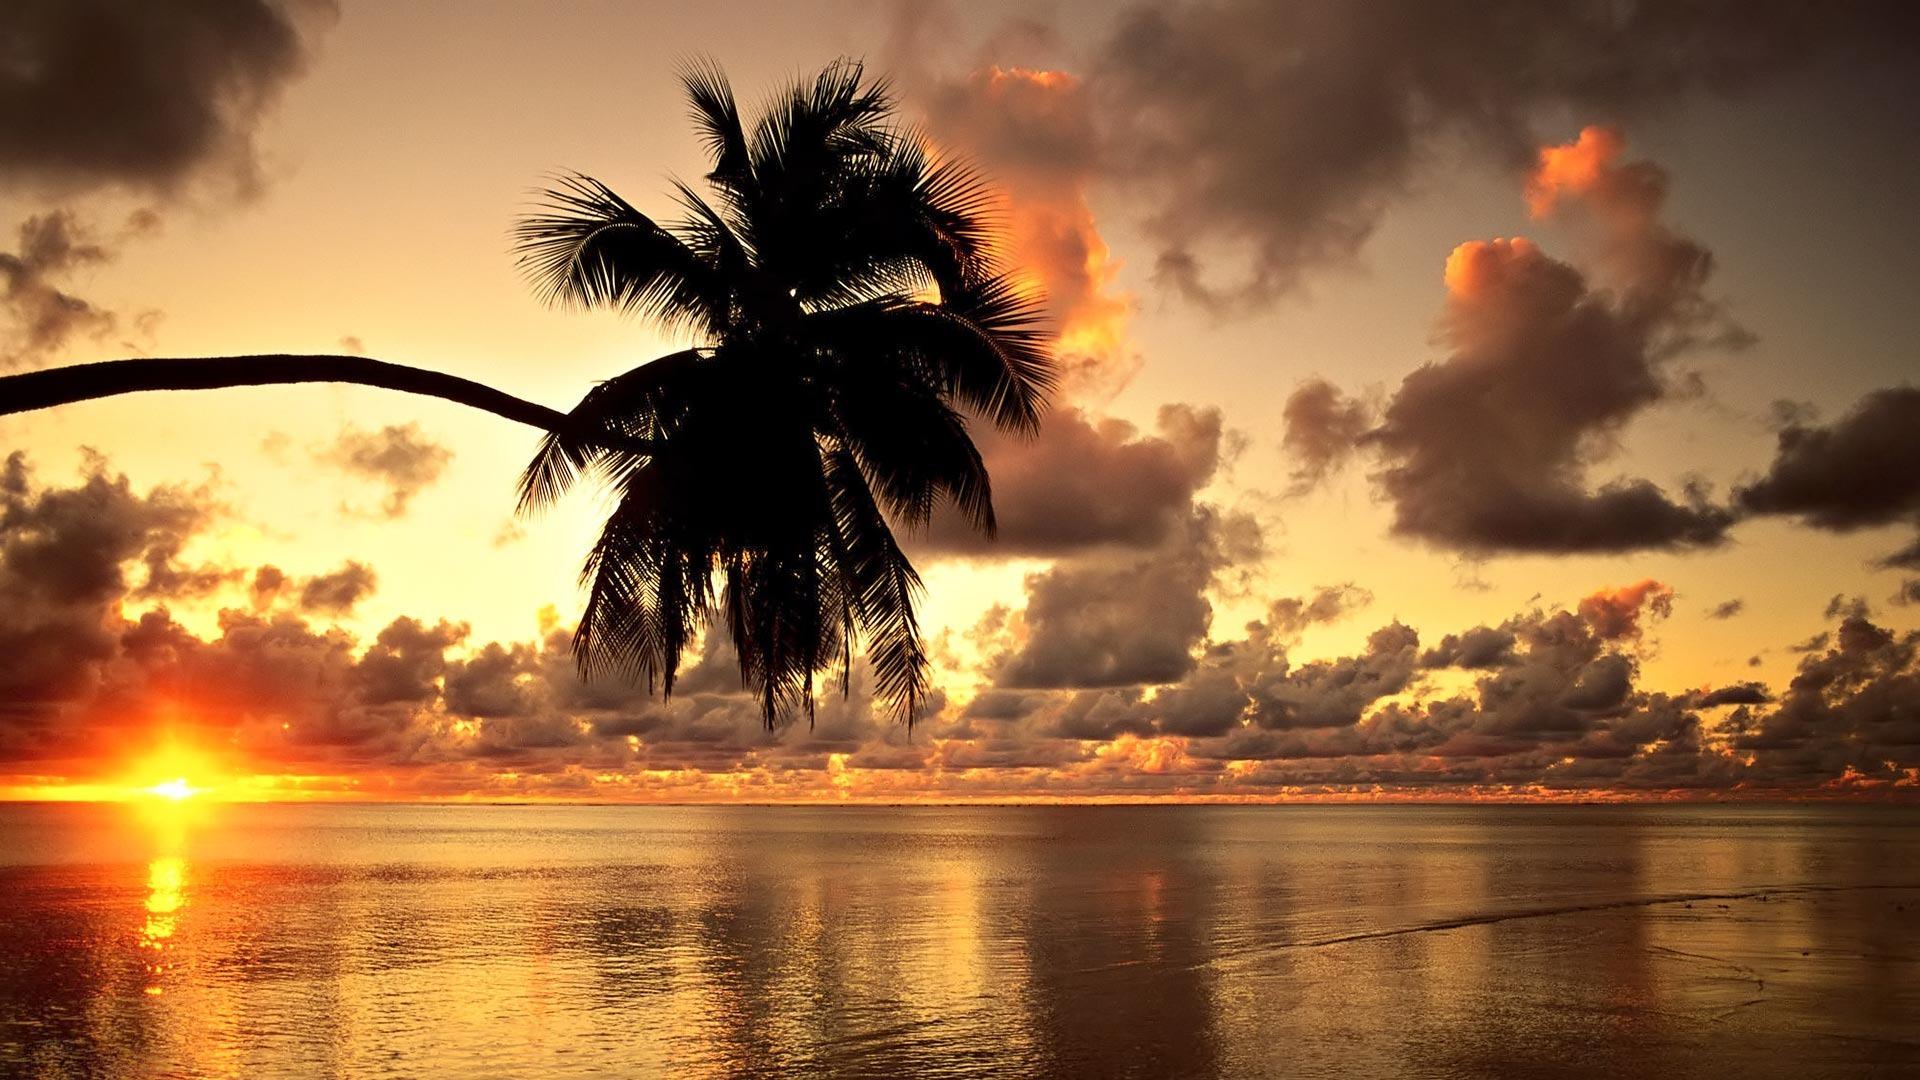 Hawaiian Sunset HD Beach Wallpapers 1080p HD Wallpapers Source 1920x1080